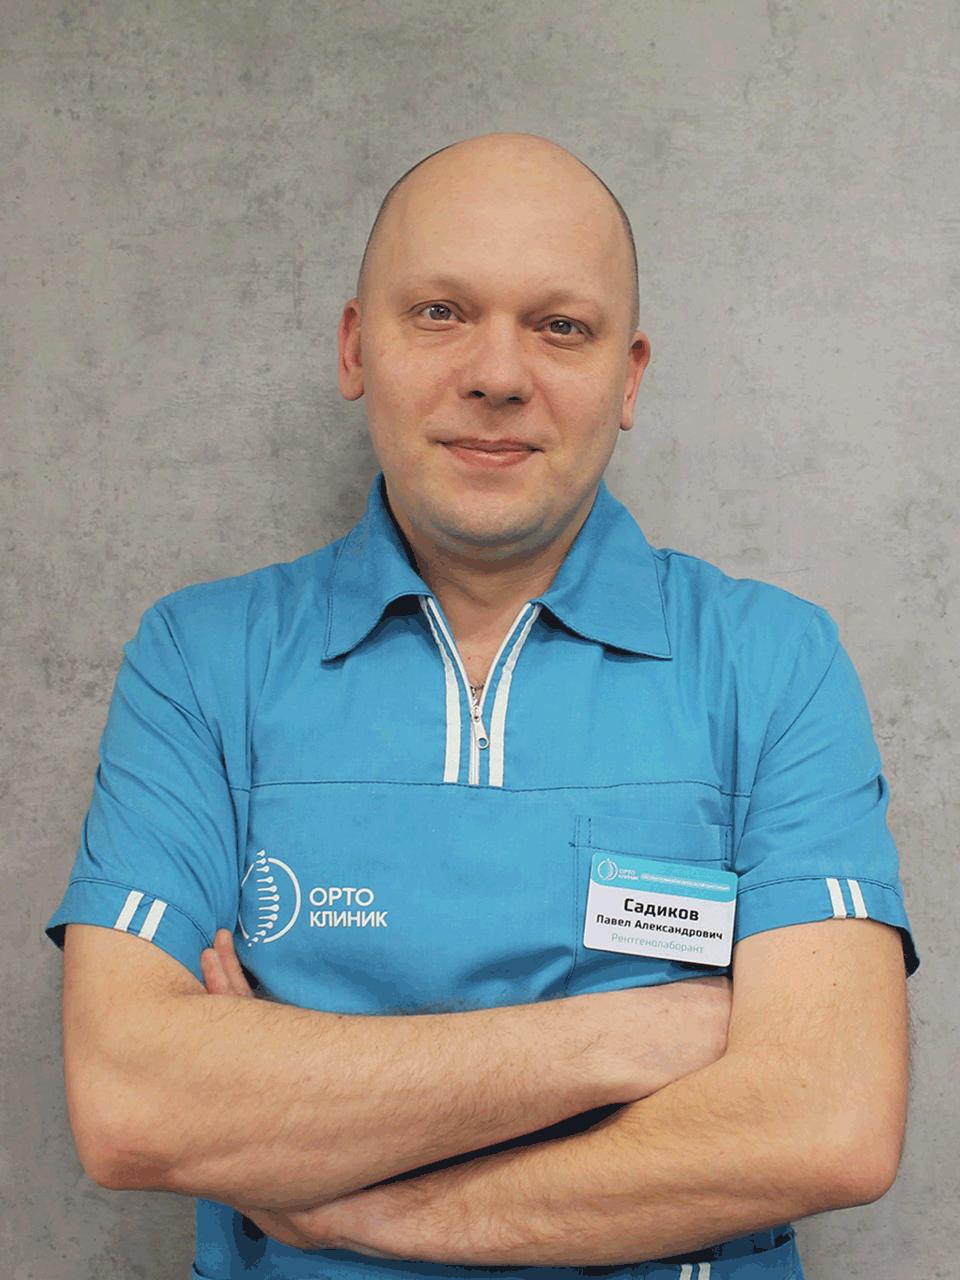 Рентгенолаборант Садиков Павел Александрович